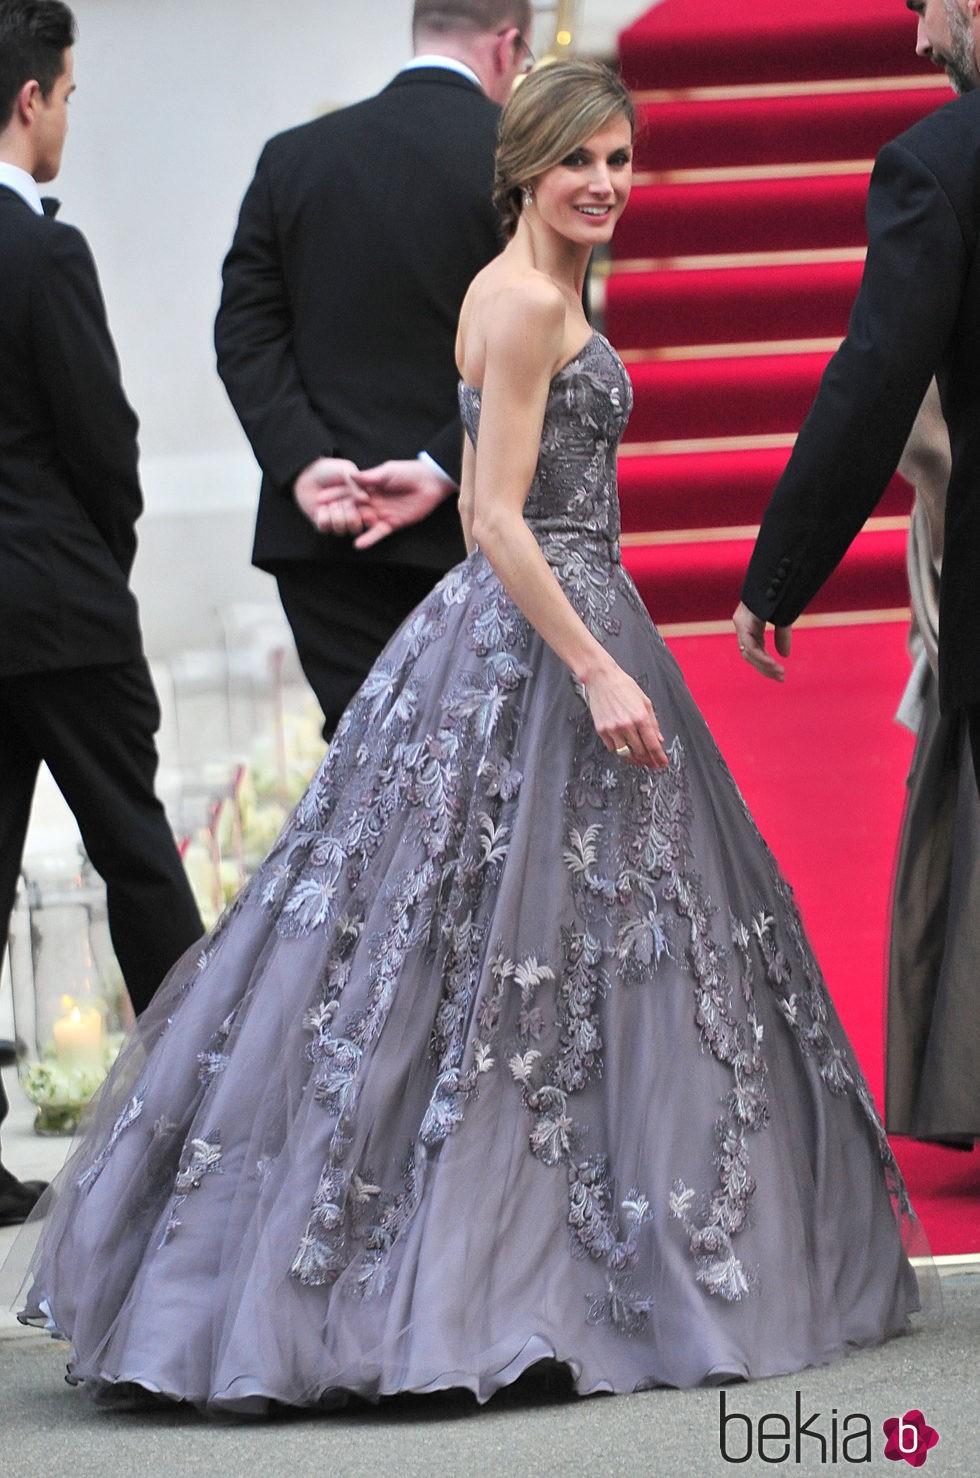 78607_reina-letizia-vestido-felipe-varela-boda-duques-cambridge.jpg